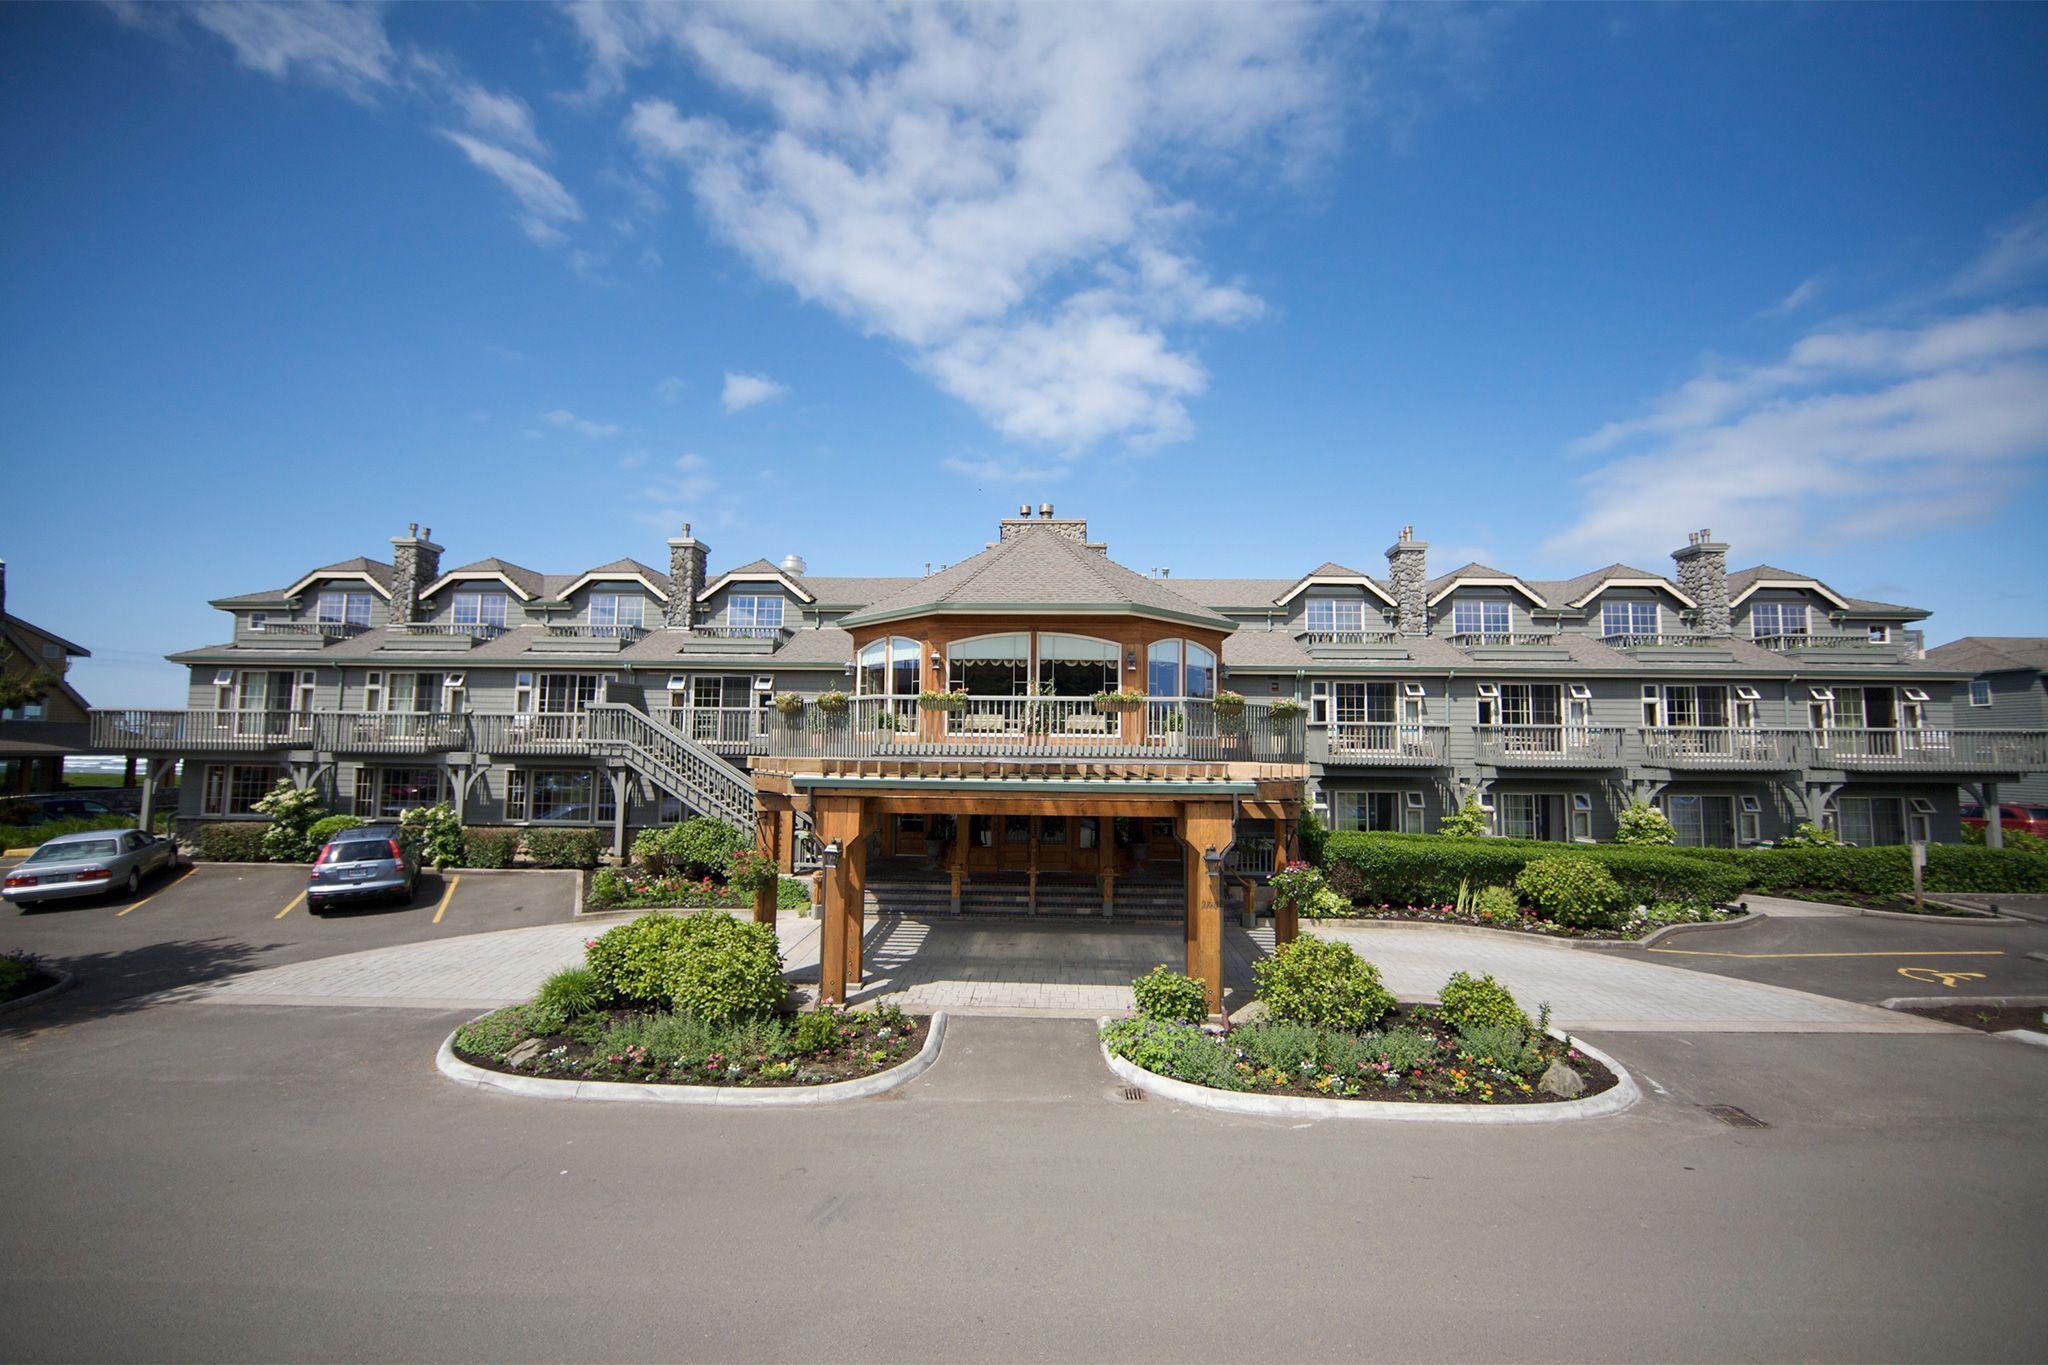 Located Just Nine Miles South Of The City Seaside Oregon Stephanie Inn Is Conveniently Near Washington Border